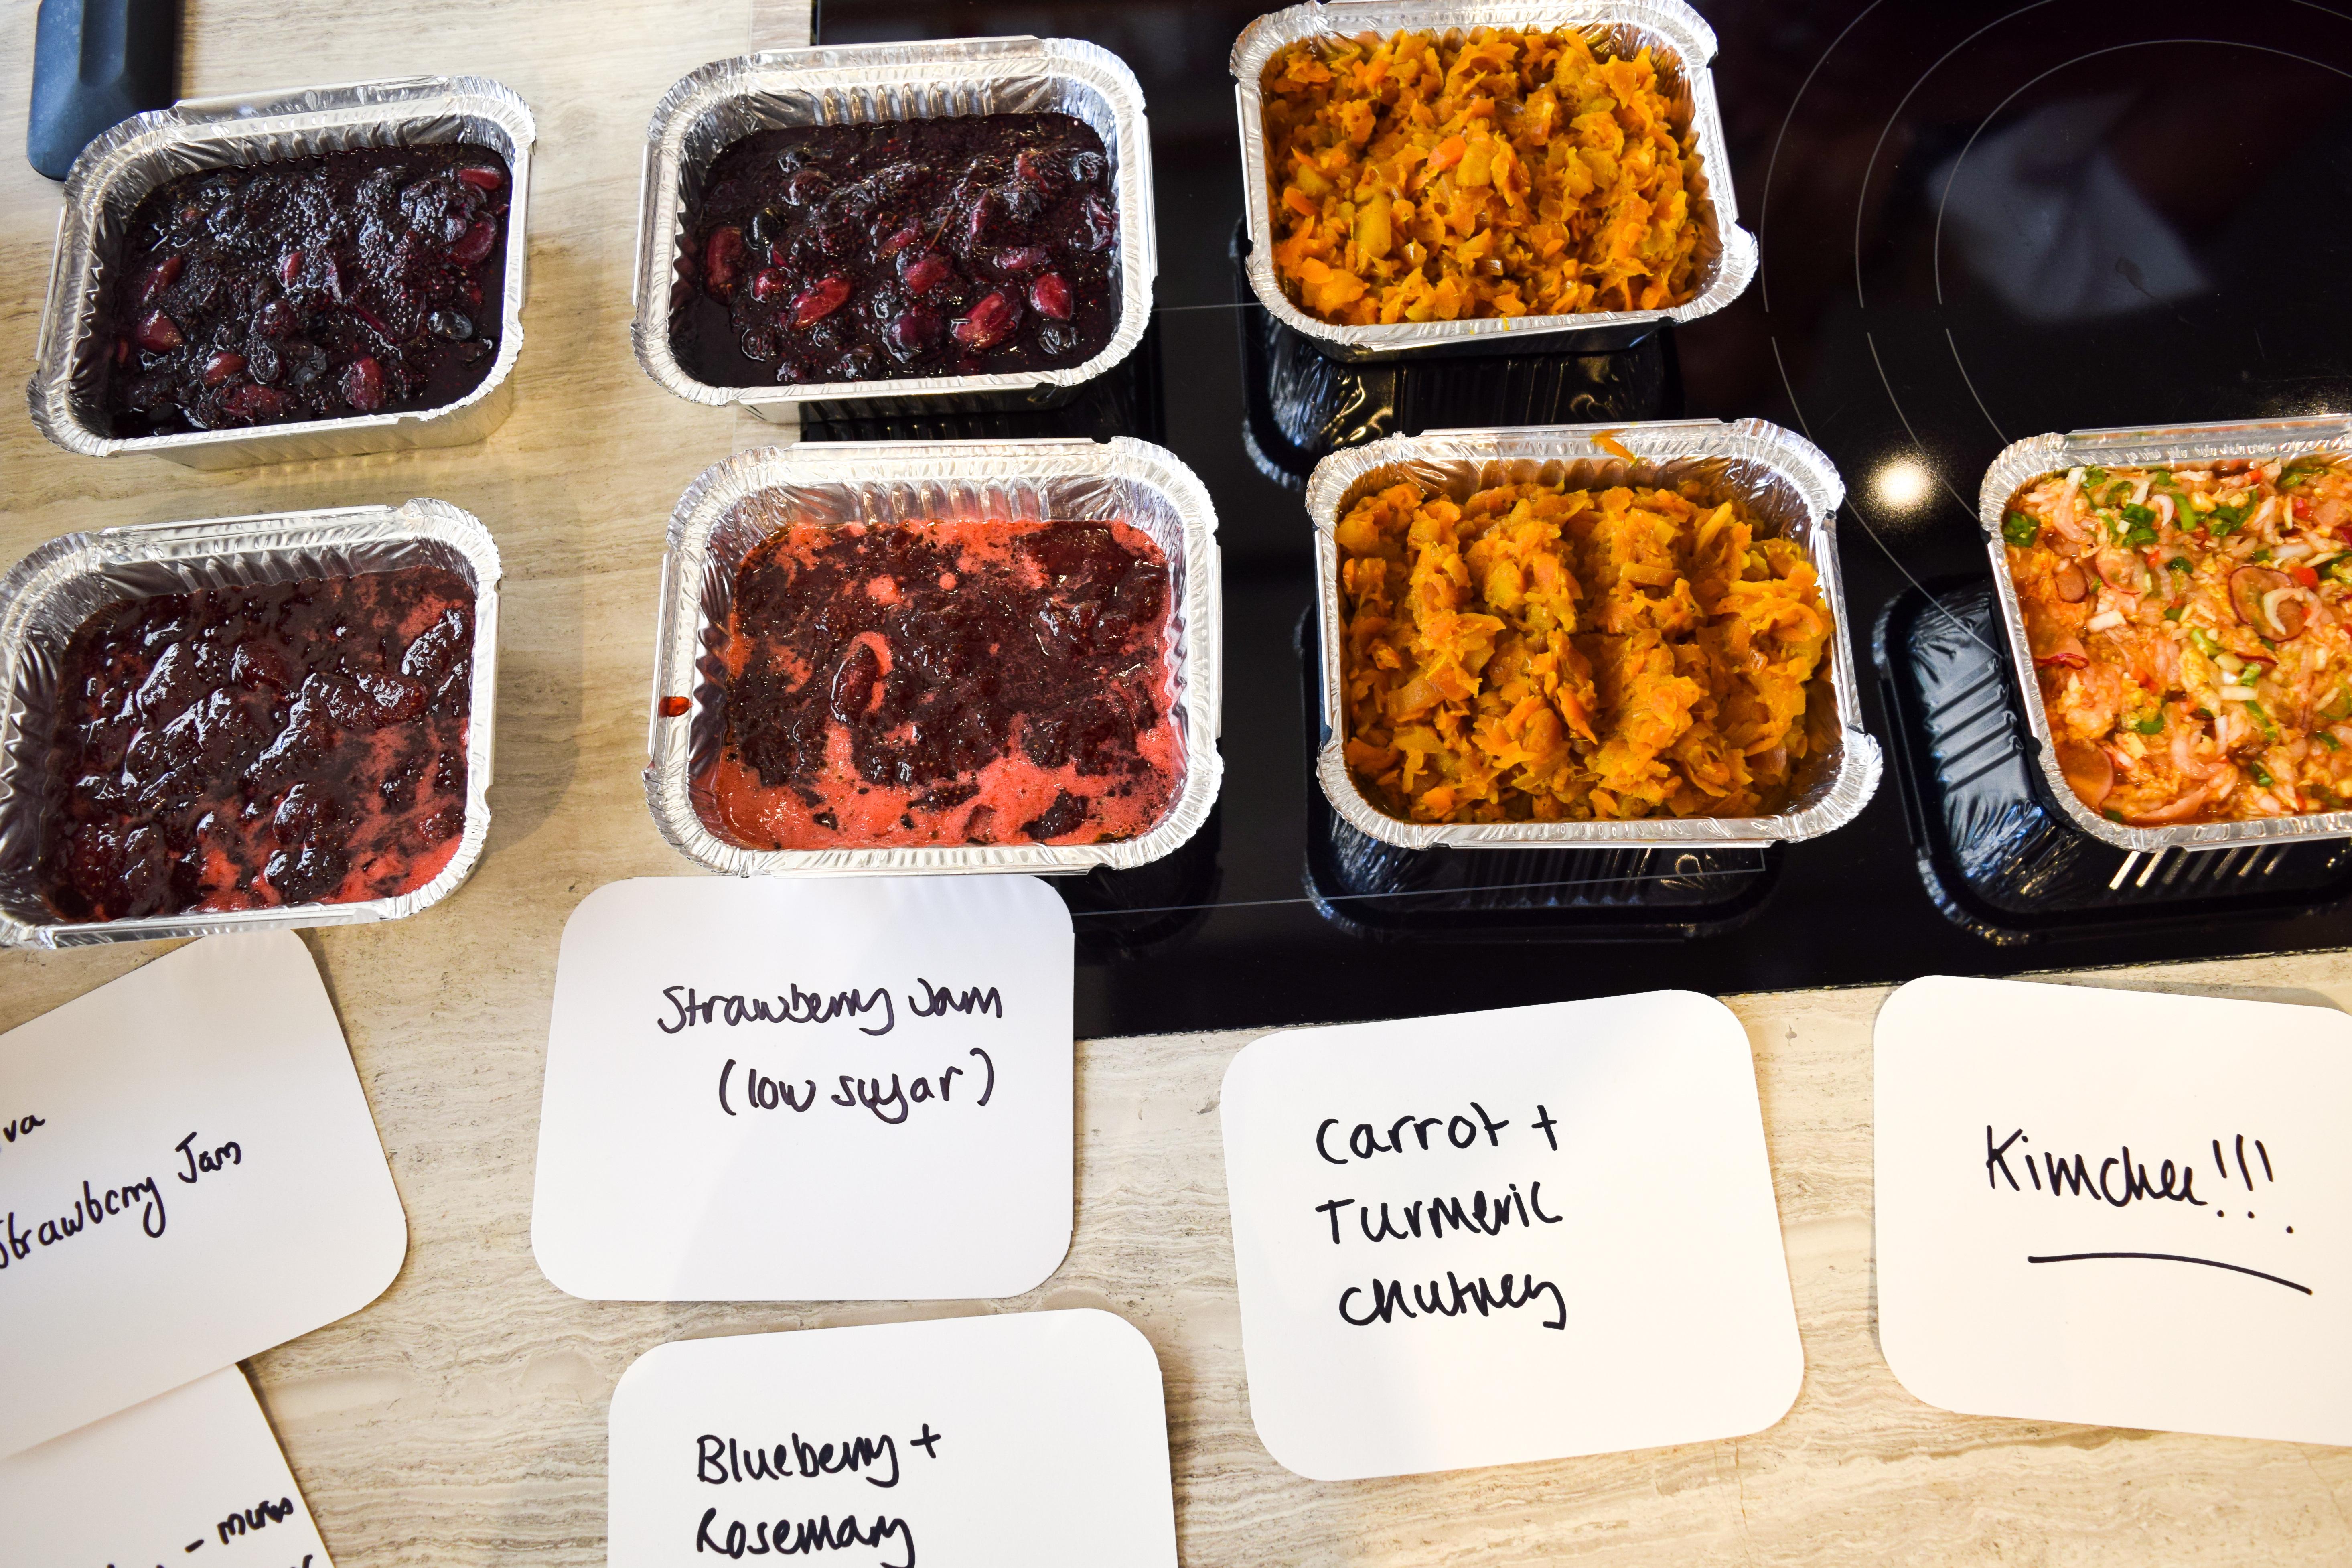 Jam and Preserves Masterclass at Borough Kitchen